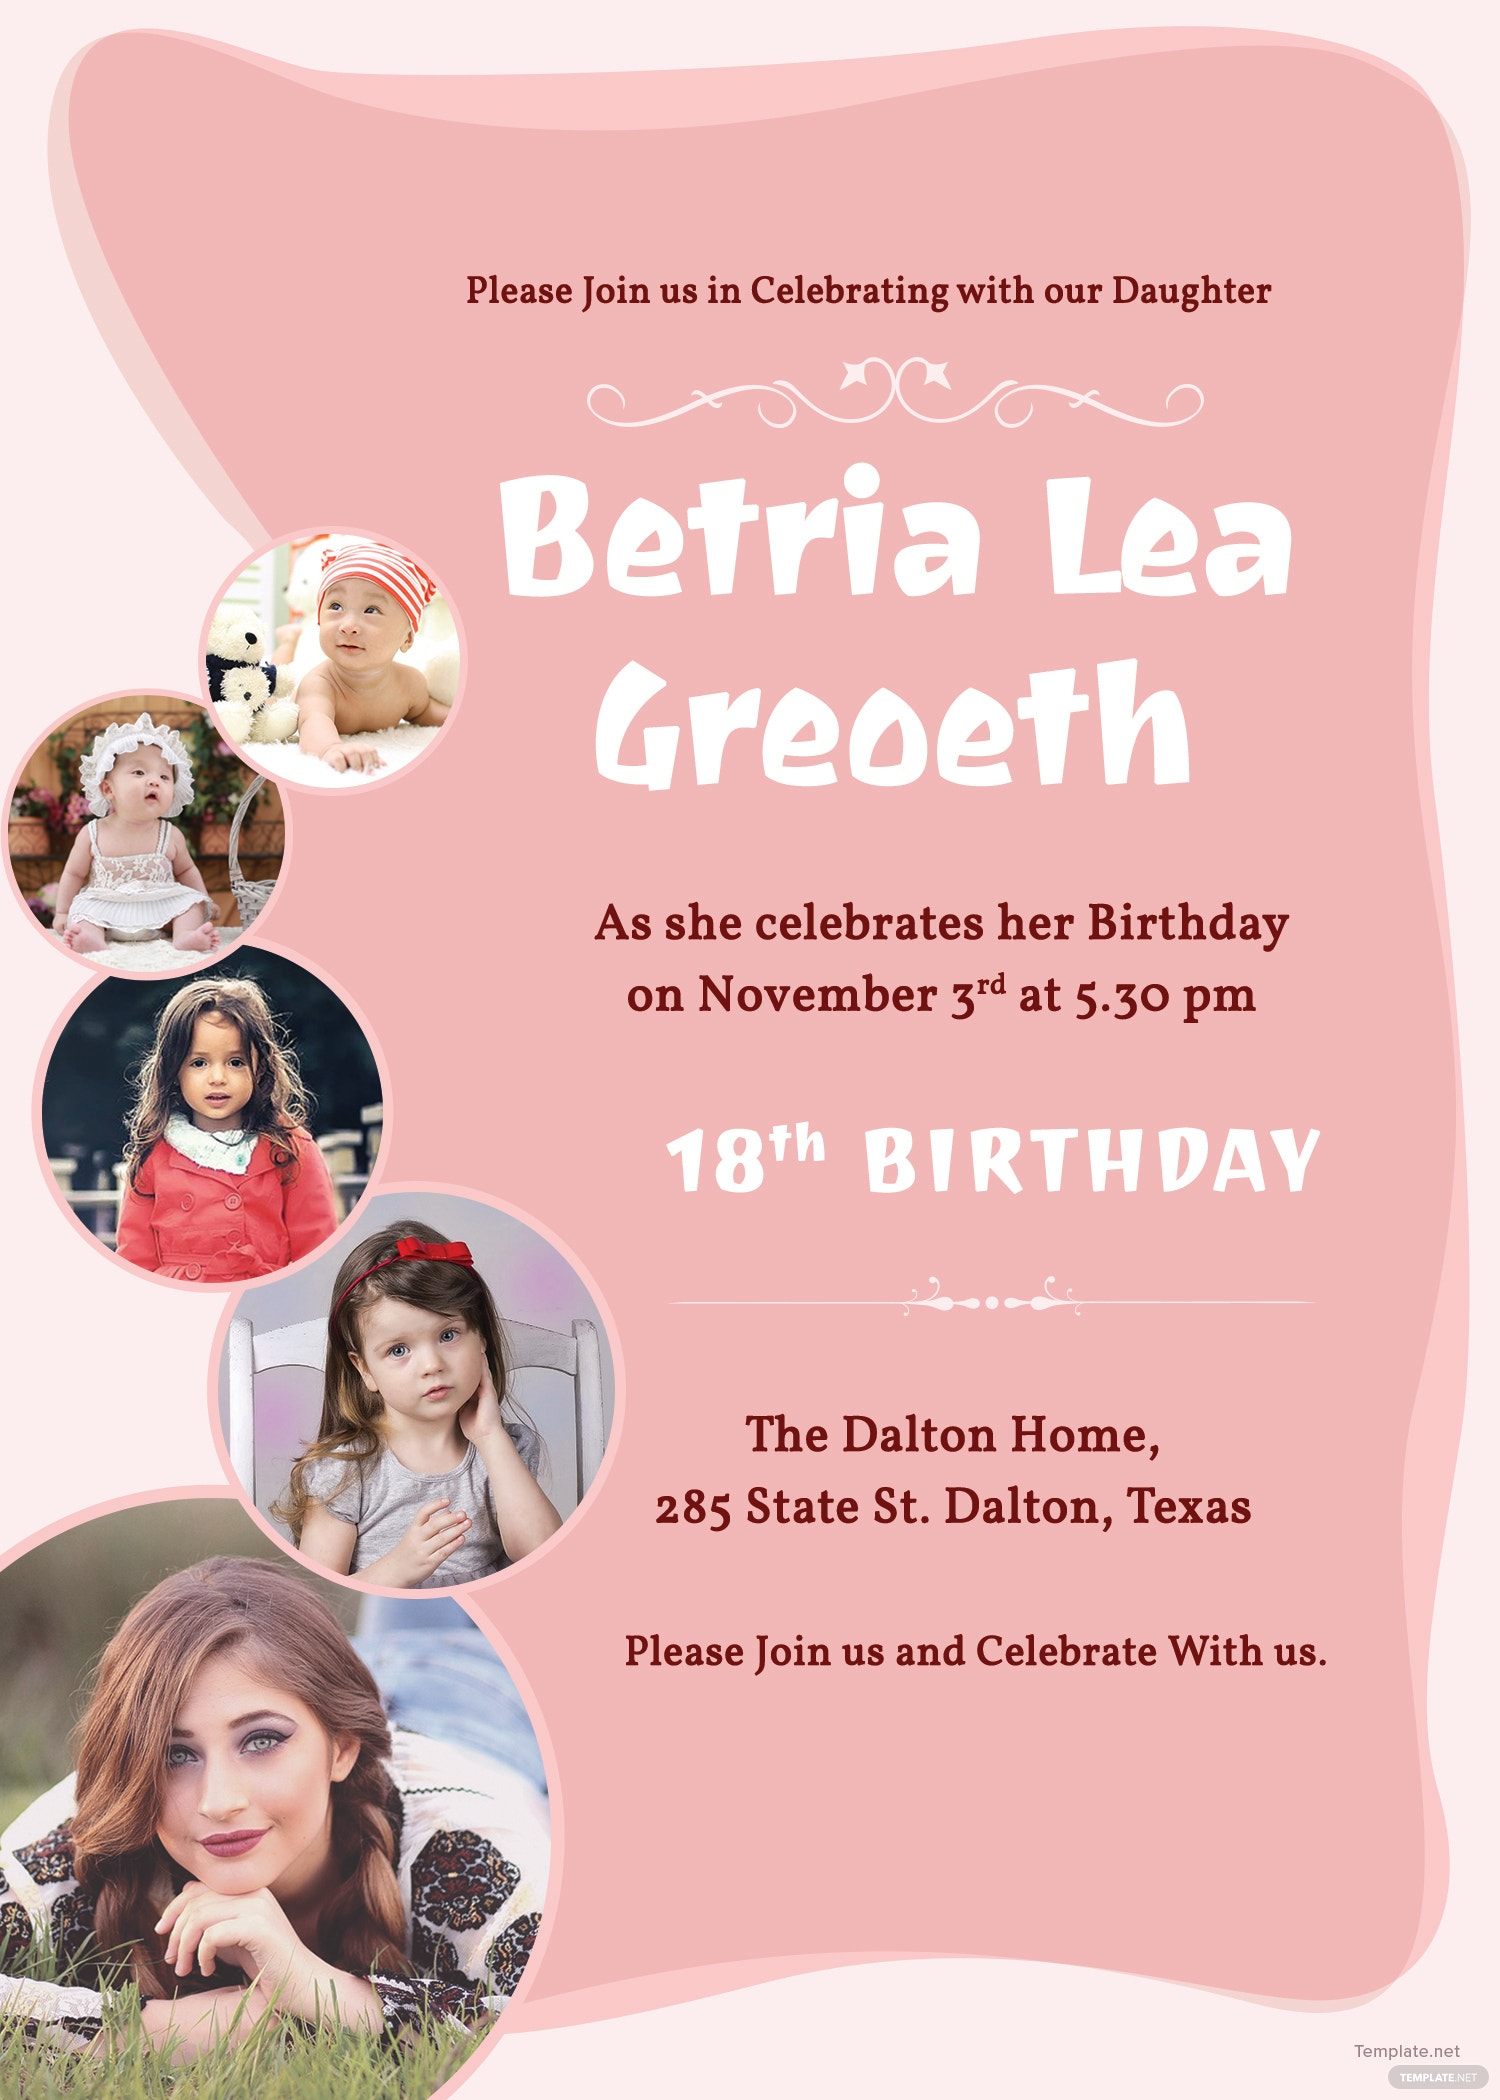 18th Birthday Invitation Template in Adobe Photoshop, Illustrator ...